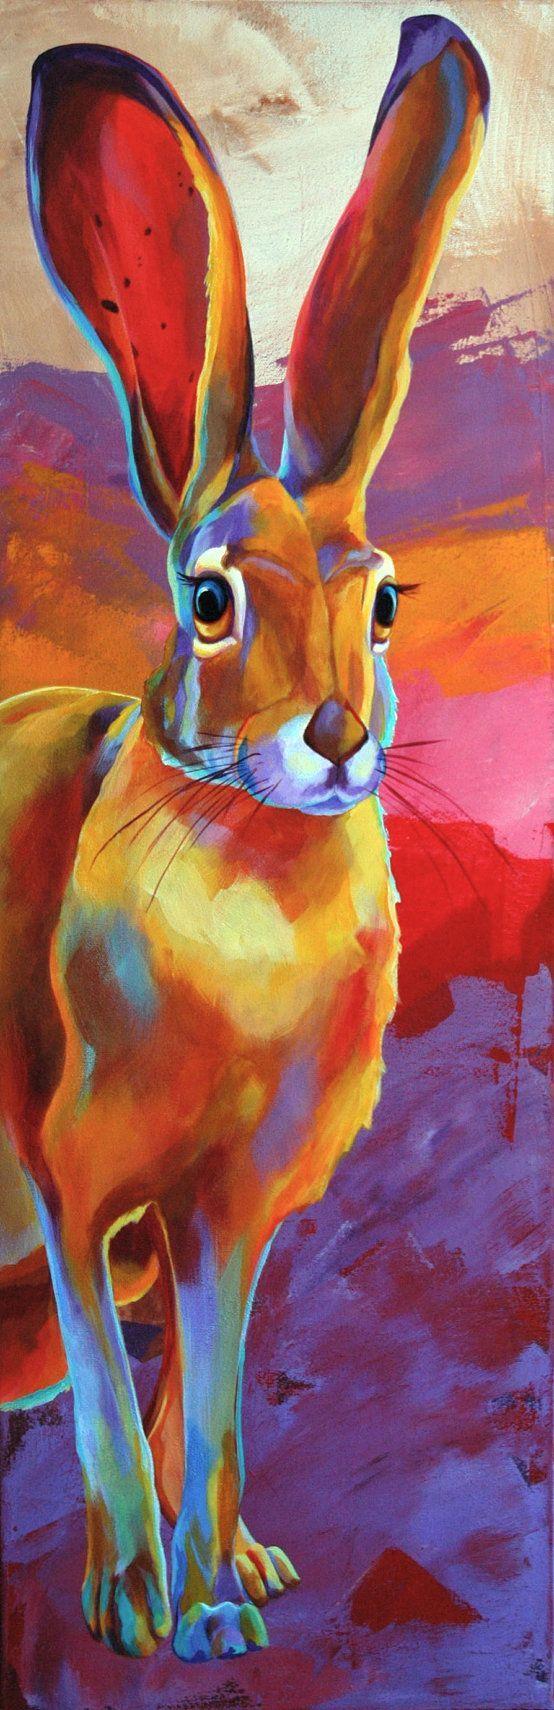 Jack Rabbit  Original Rabbit Giclee PRINT  By by CorinaStMartinArt, $15.00 color theory example: